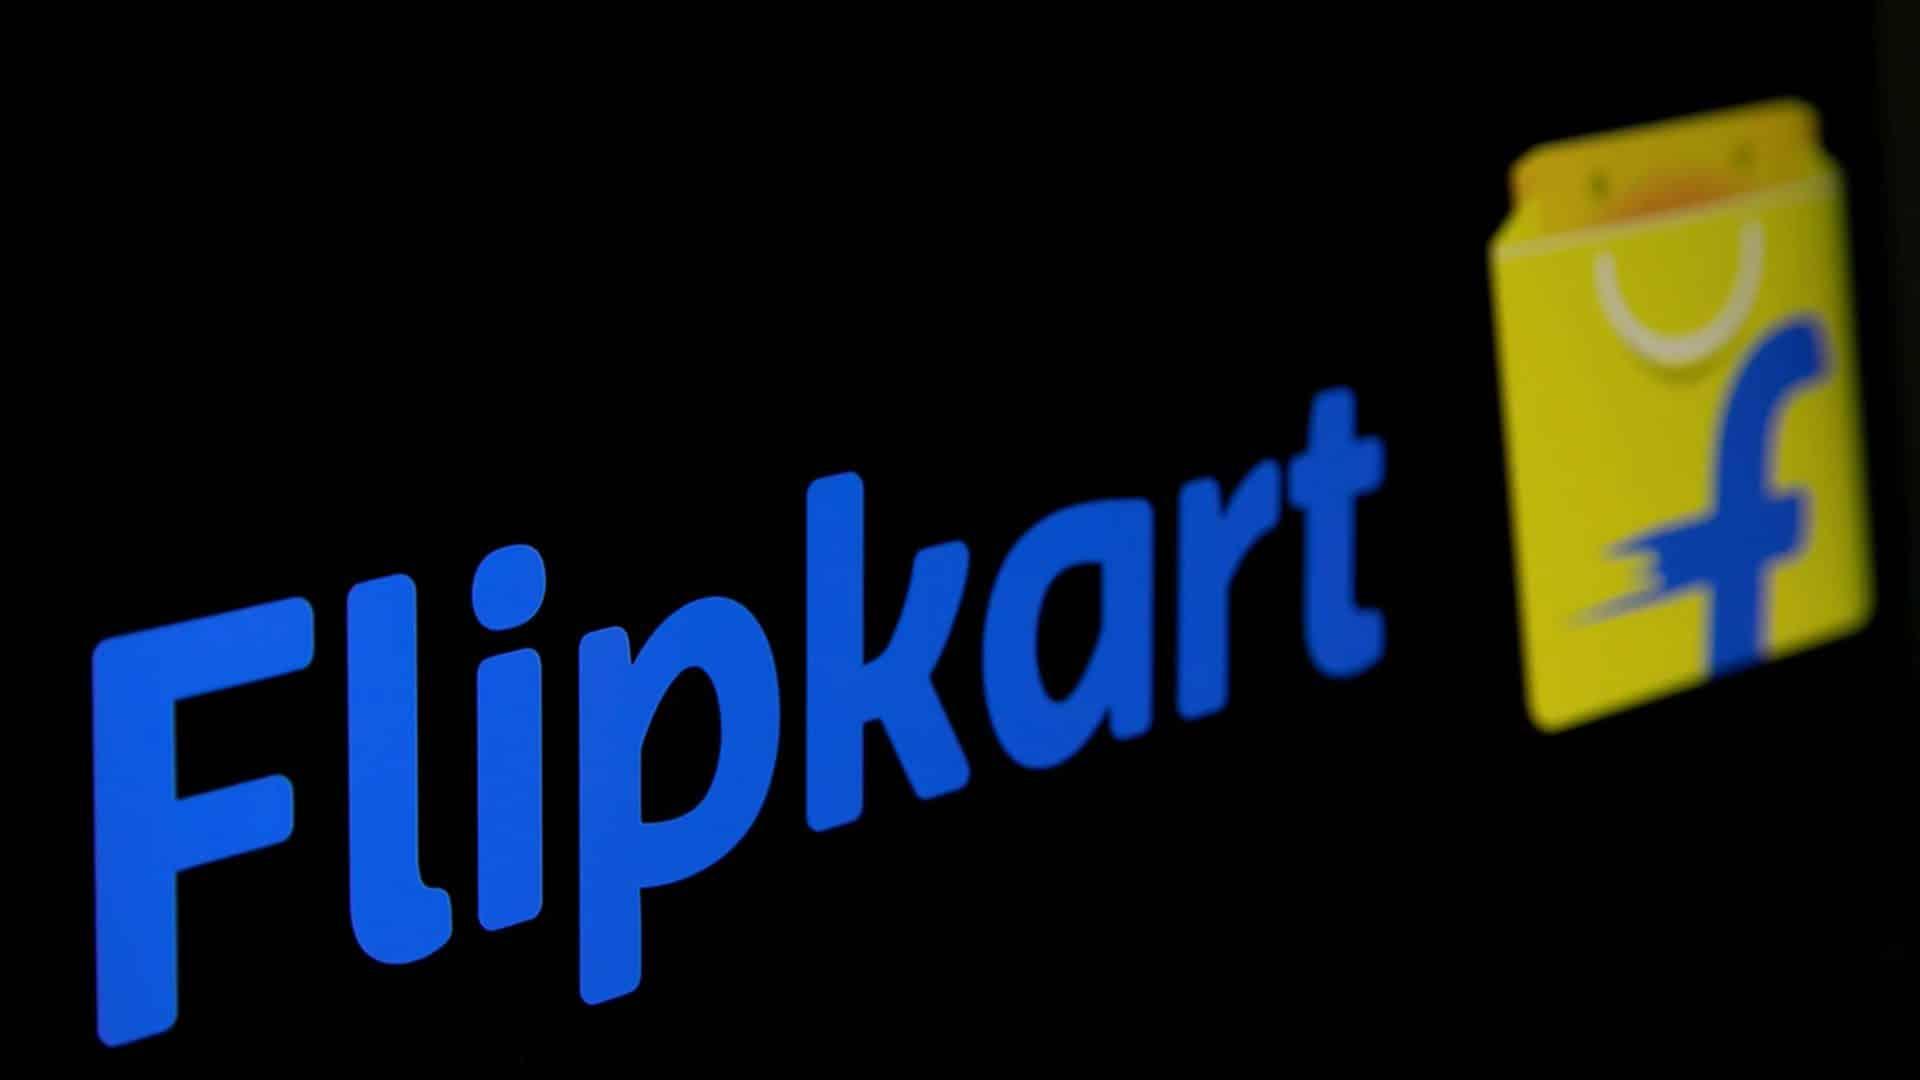 Flipkart valuation jumps to USD 37.6 bn after USD 3.6 bn fundraise